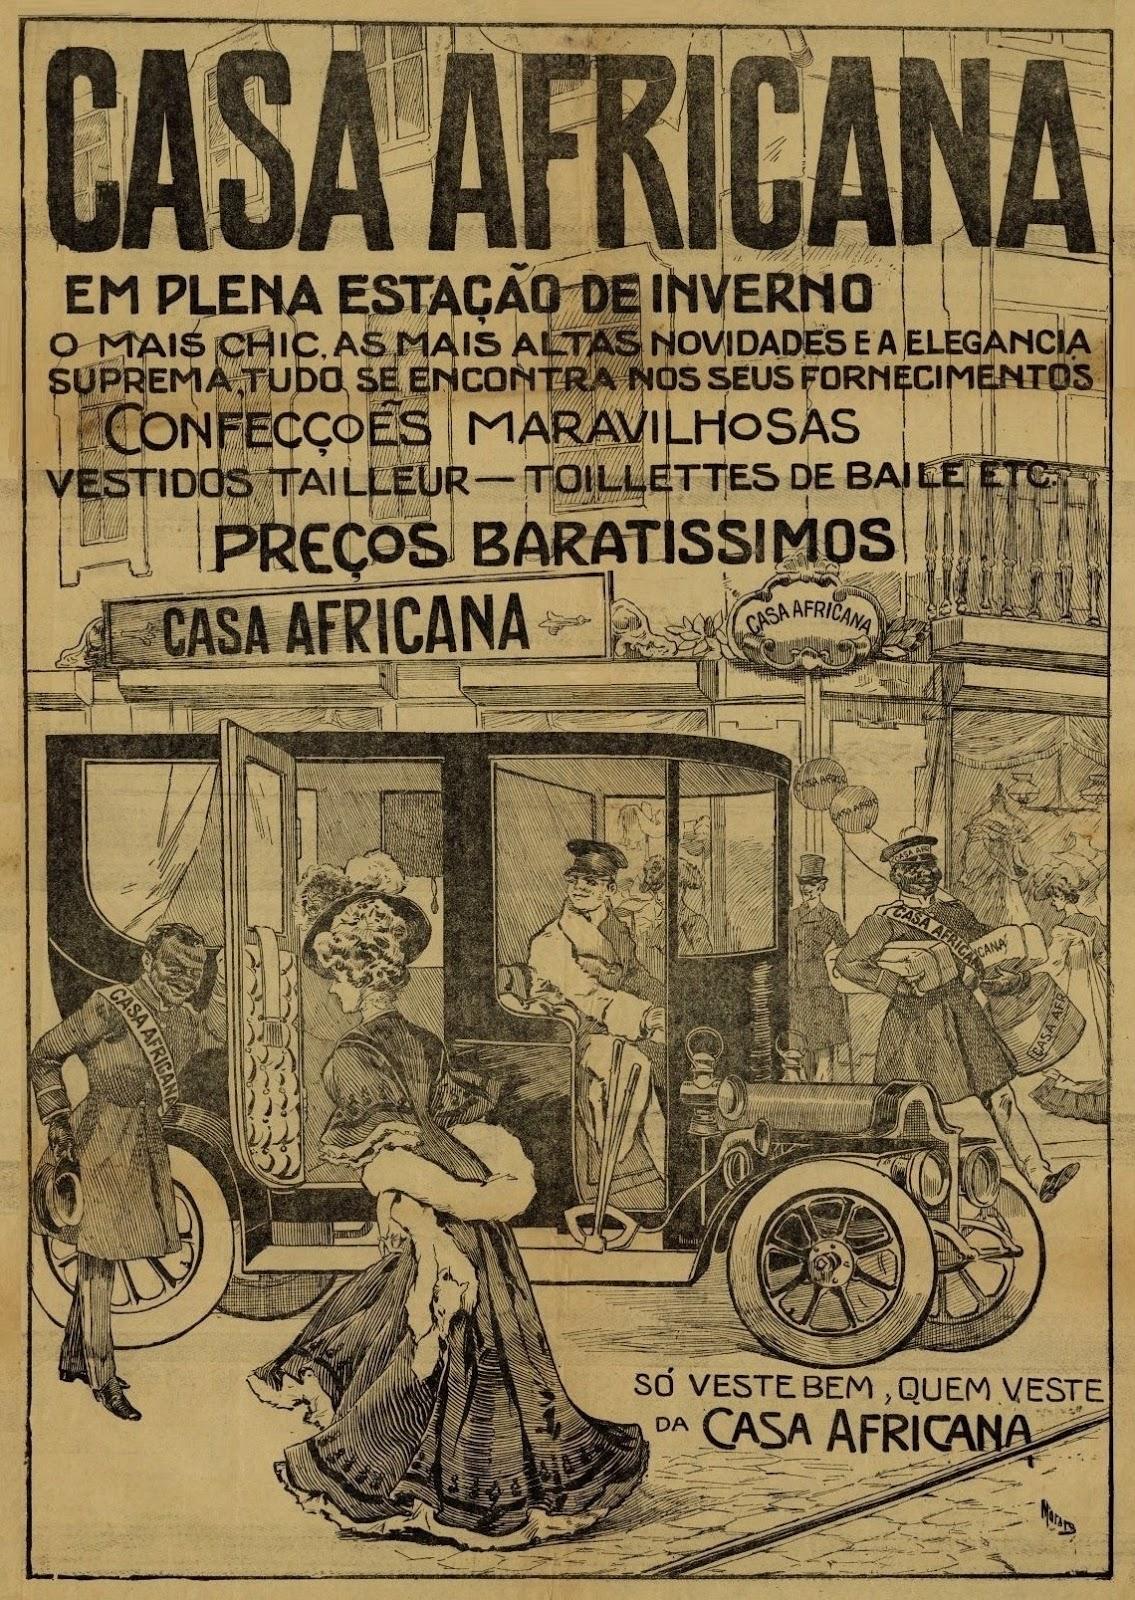 Propaganda de 1905 da loja de departamentos Casa Africana